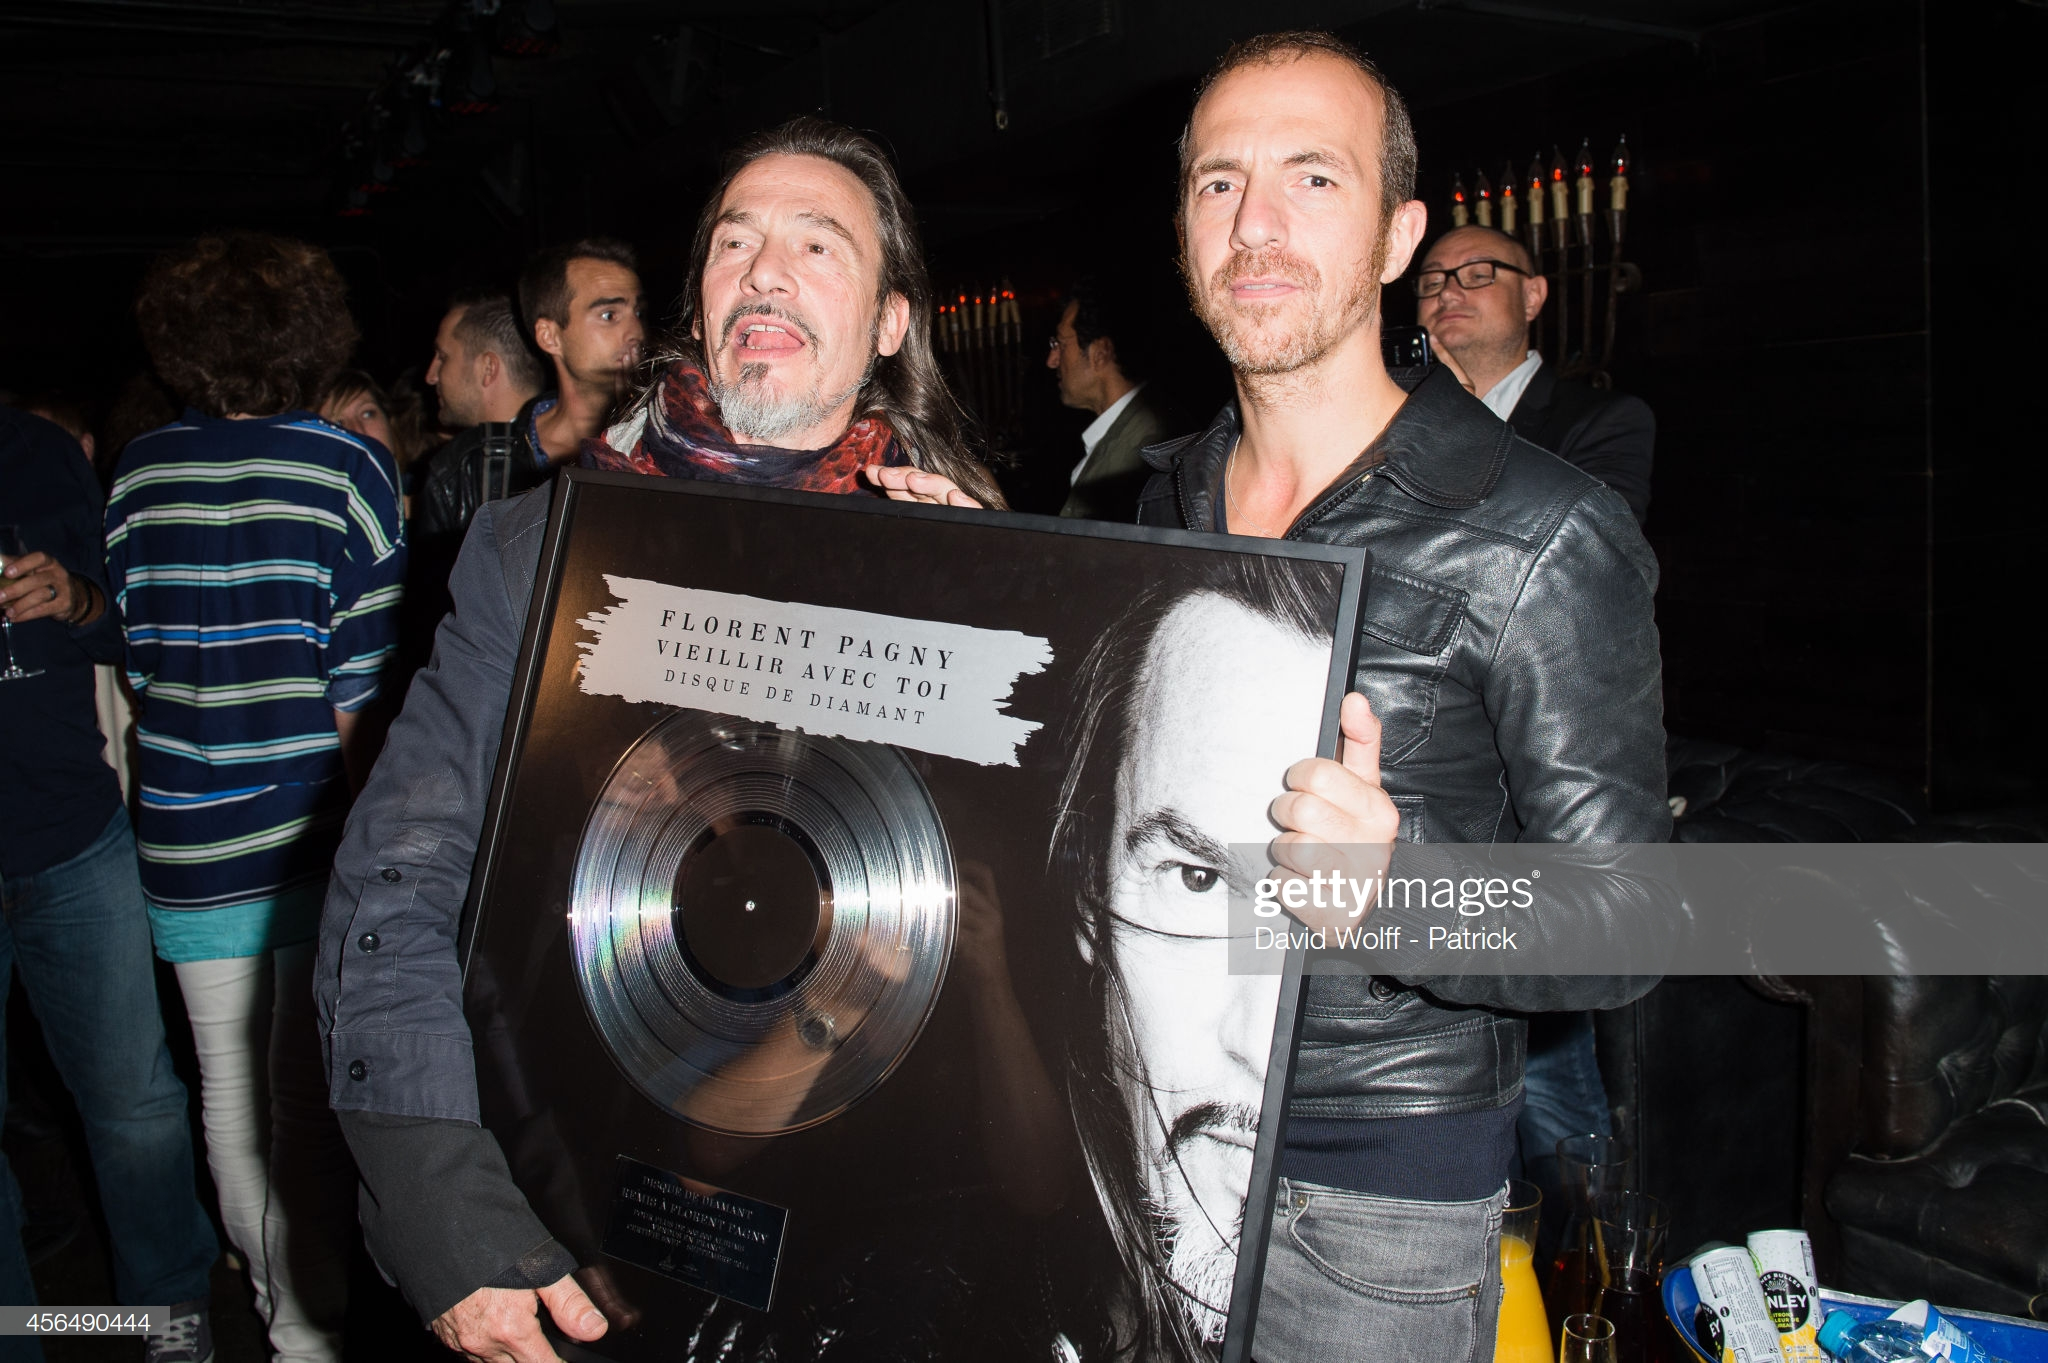 Florent Pagny disque Diamant Vieillir avec toi 01.10.2014